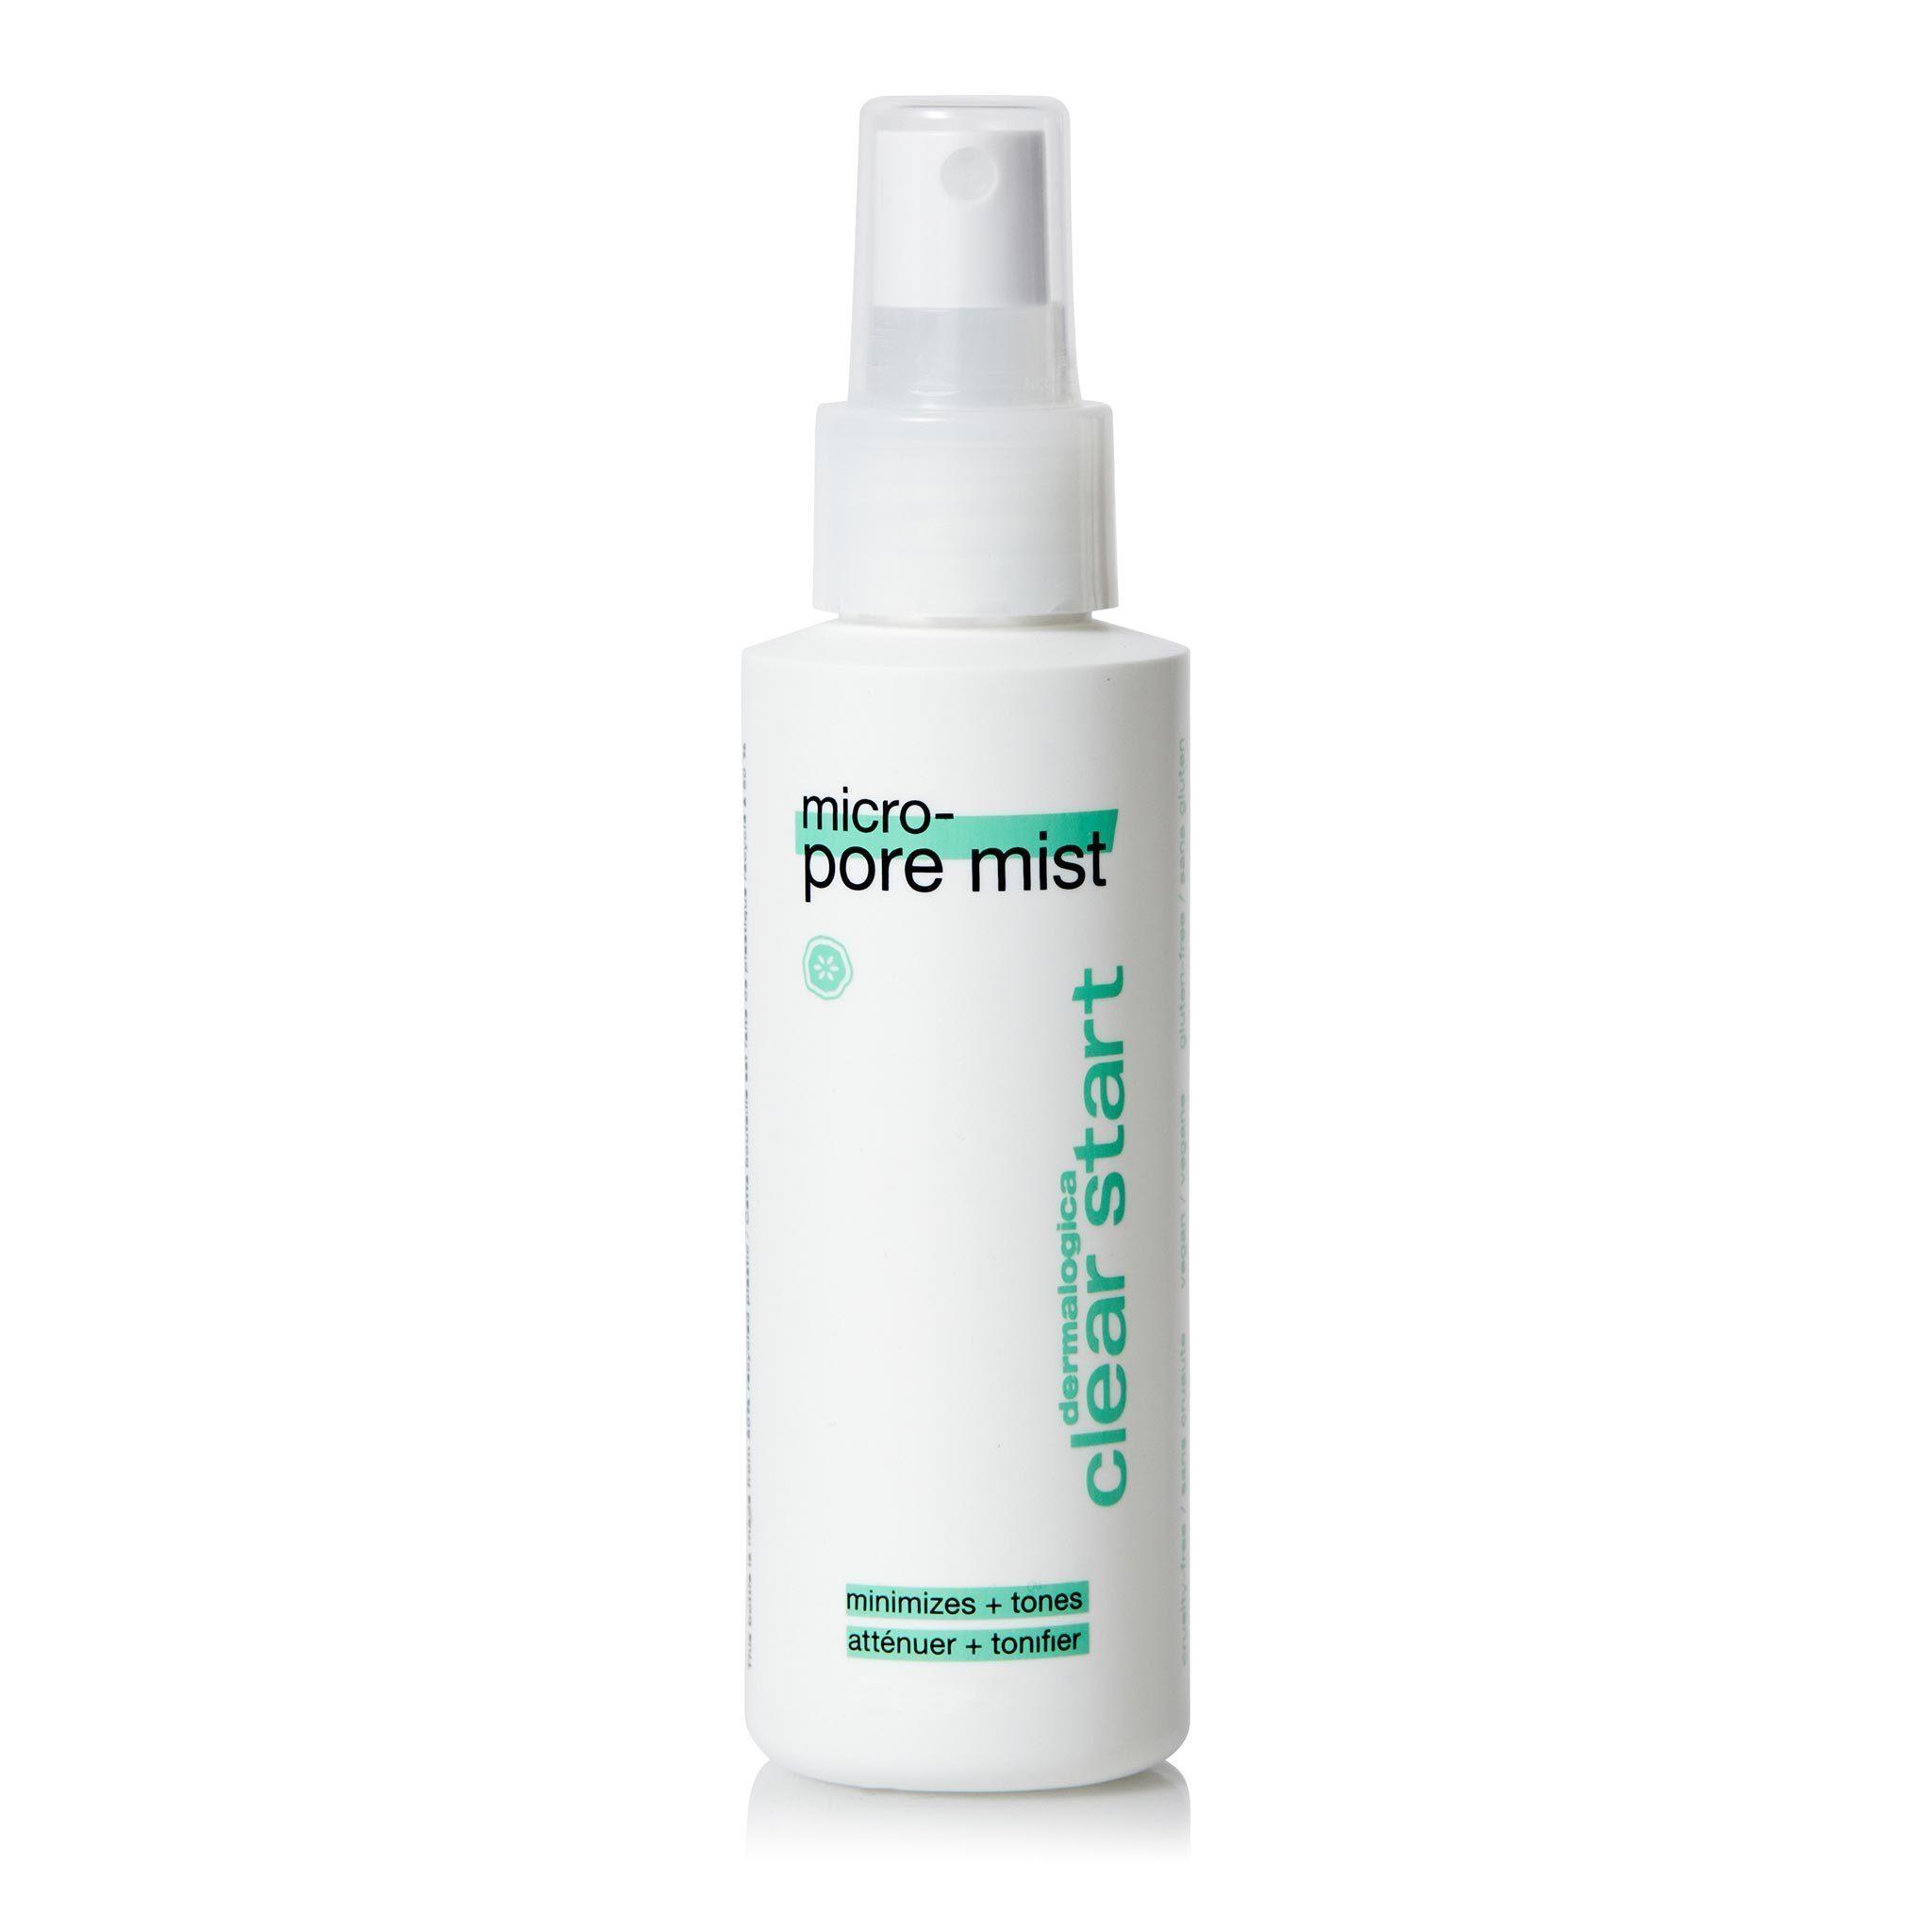 Тоник Micro-Pore Mist Dermalogica Англия 118 мл(р) — фото №1